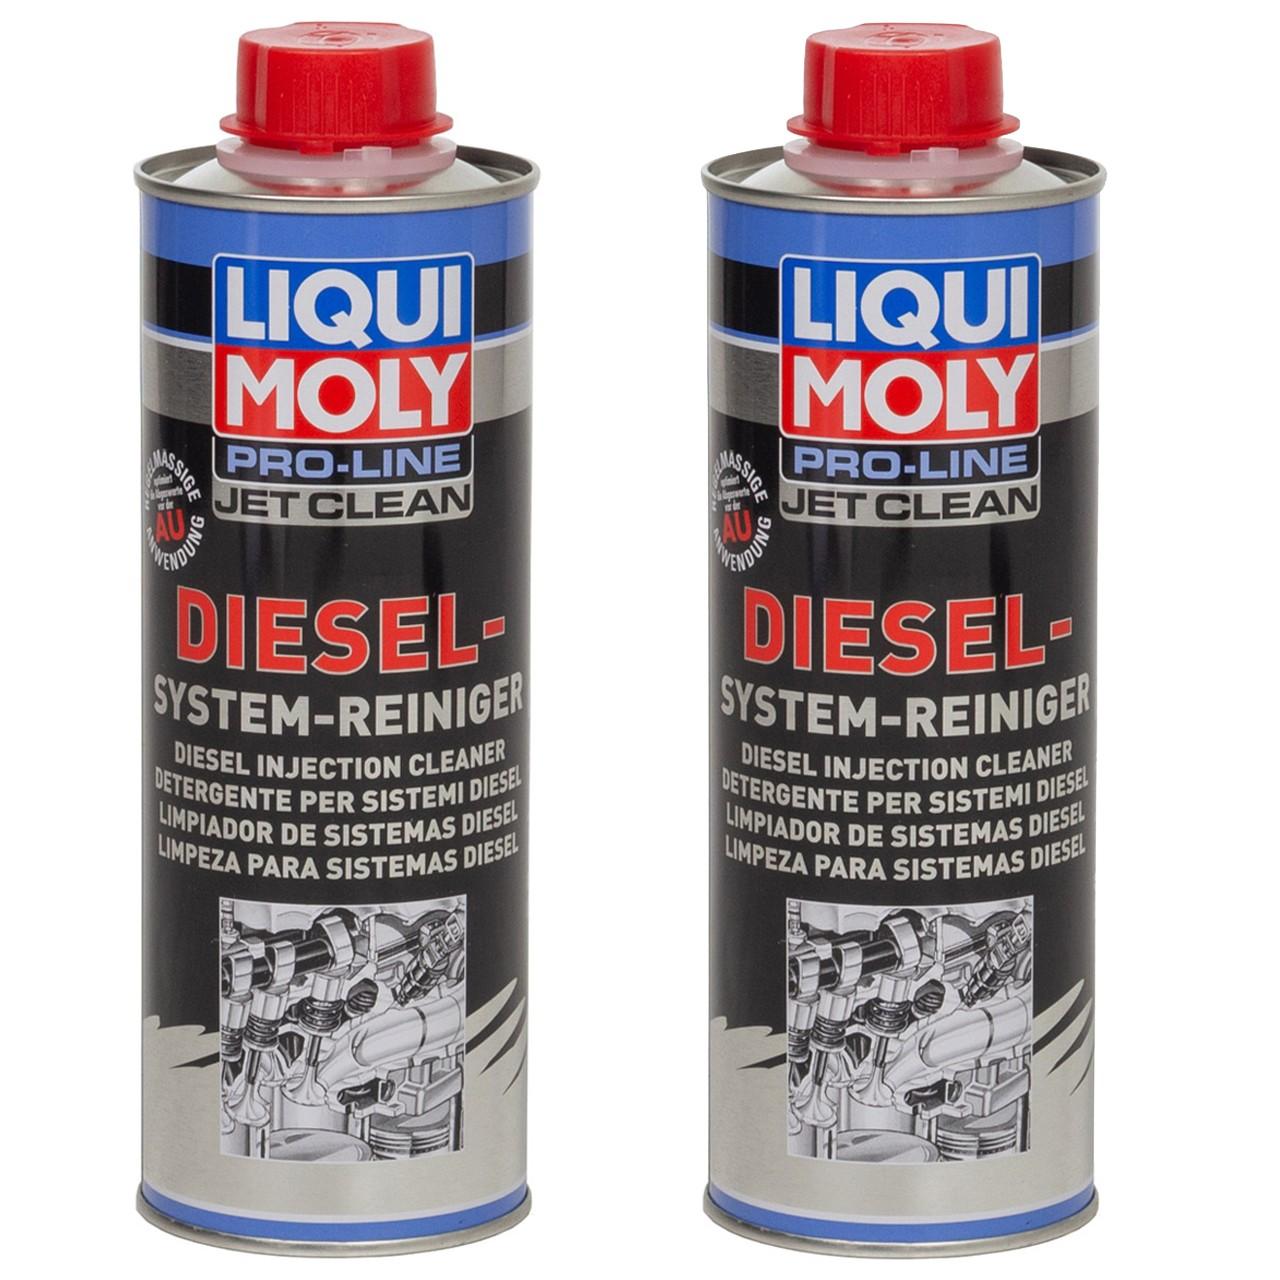 2x 500ml LIQUI MOLY 5154 Pro Line JET CLEAN Diesel System Reiniger Dose